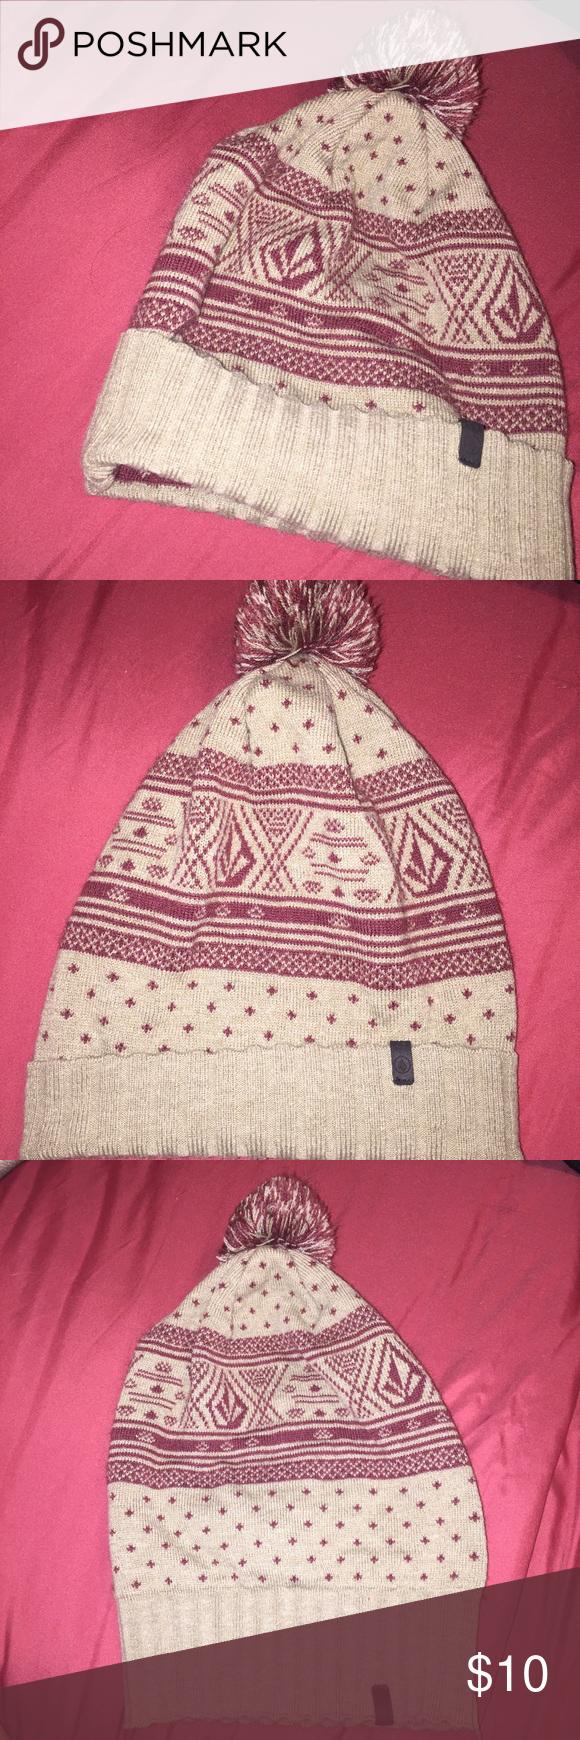 VOLCOM NEVER WORN before beanie!! Never been WORN! Like brand new! Volcom Accessories Hats